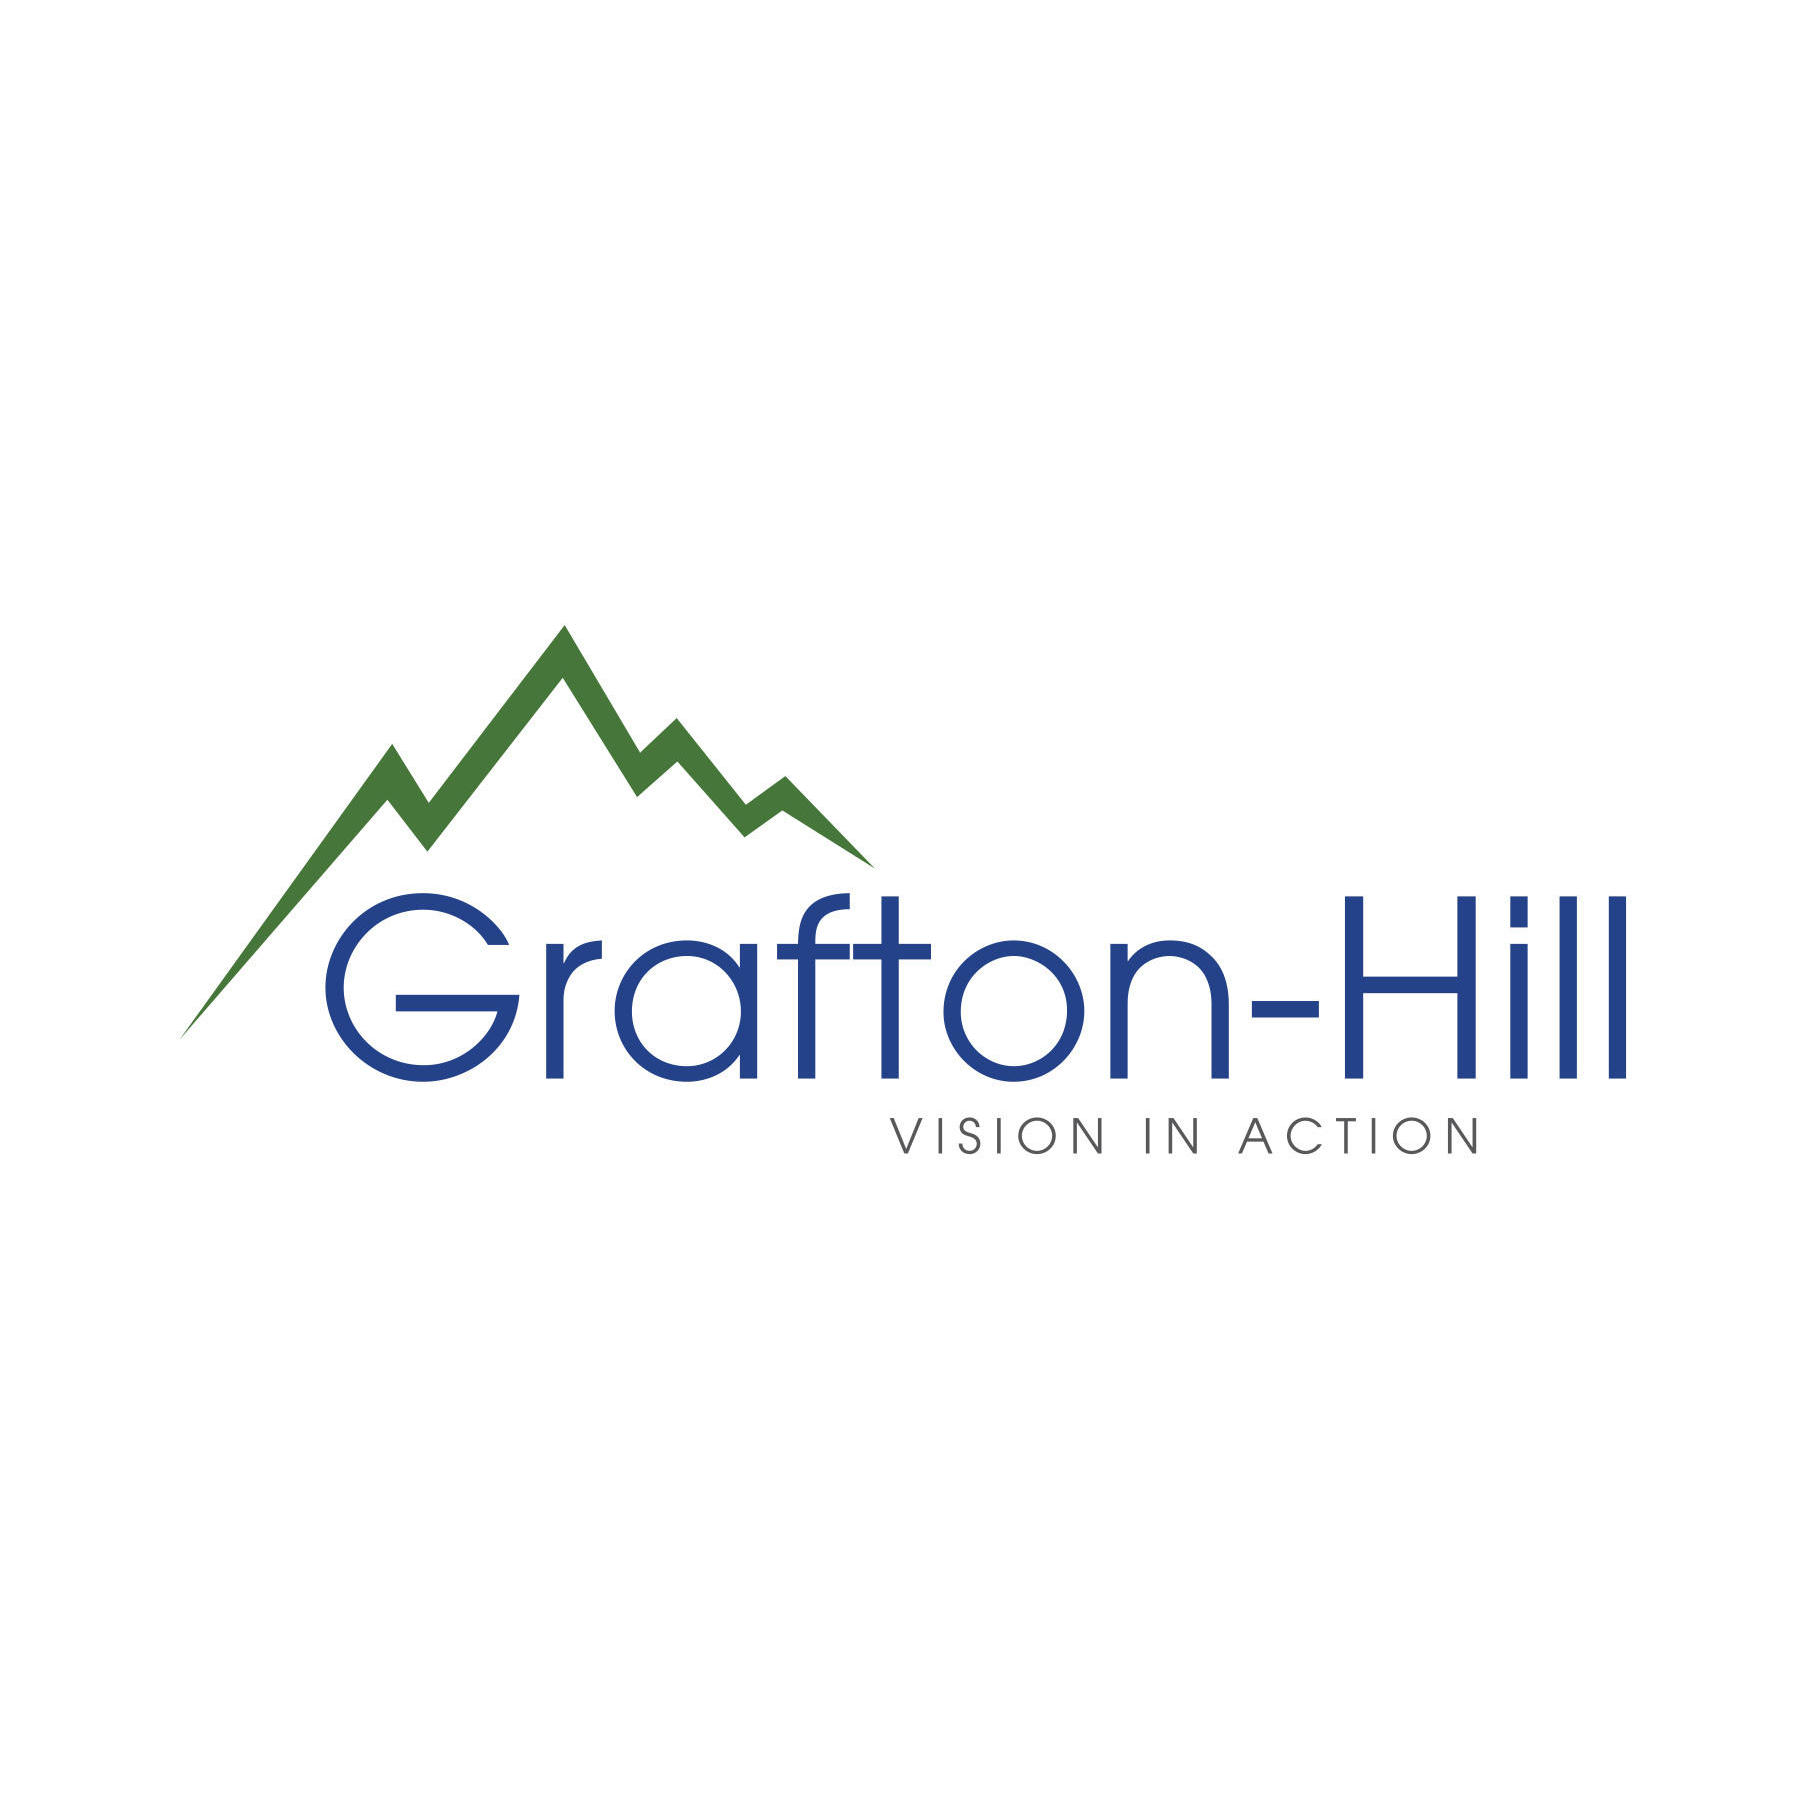 Grafton-Hill, Incorporated